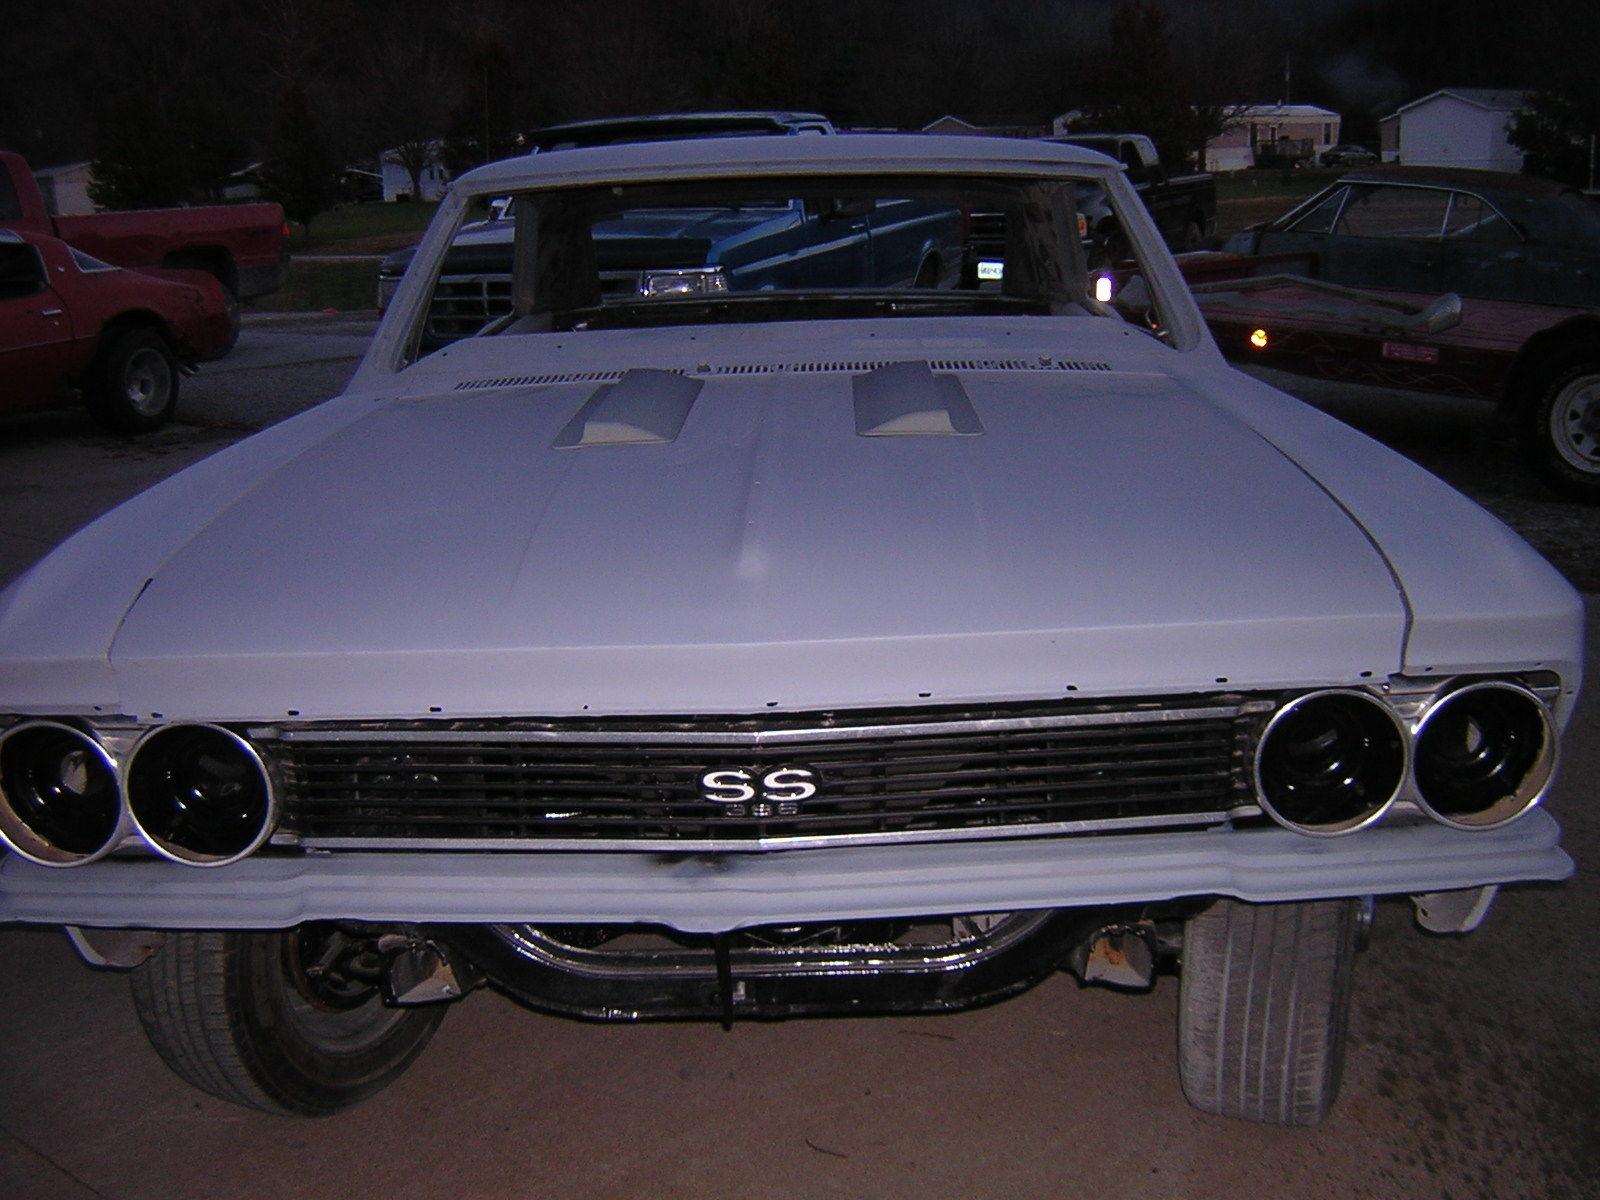 1966 Chevelle Super Sport 138 Factory 4 Speed Rotisserie Restored Chevrolet Ss 396 For Sale